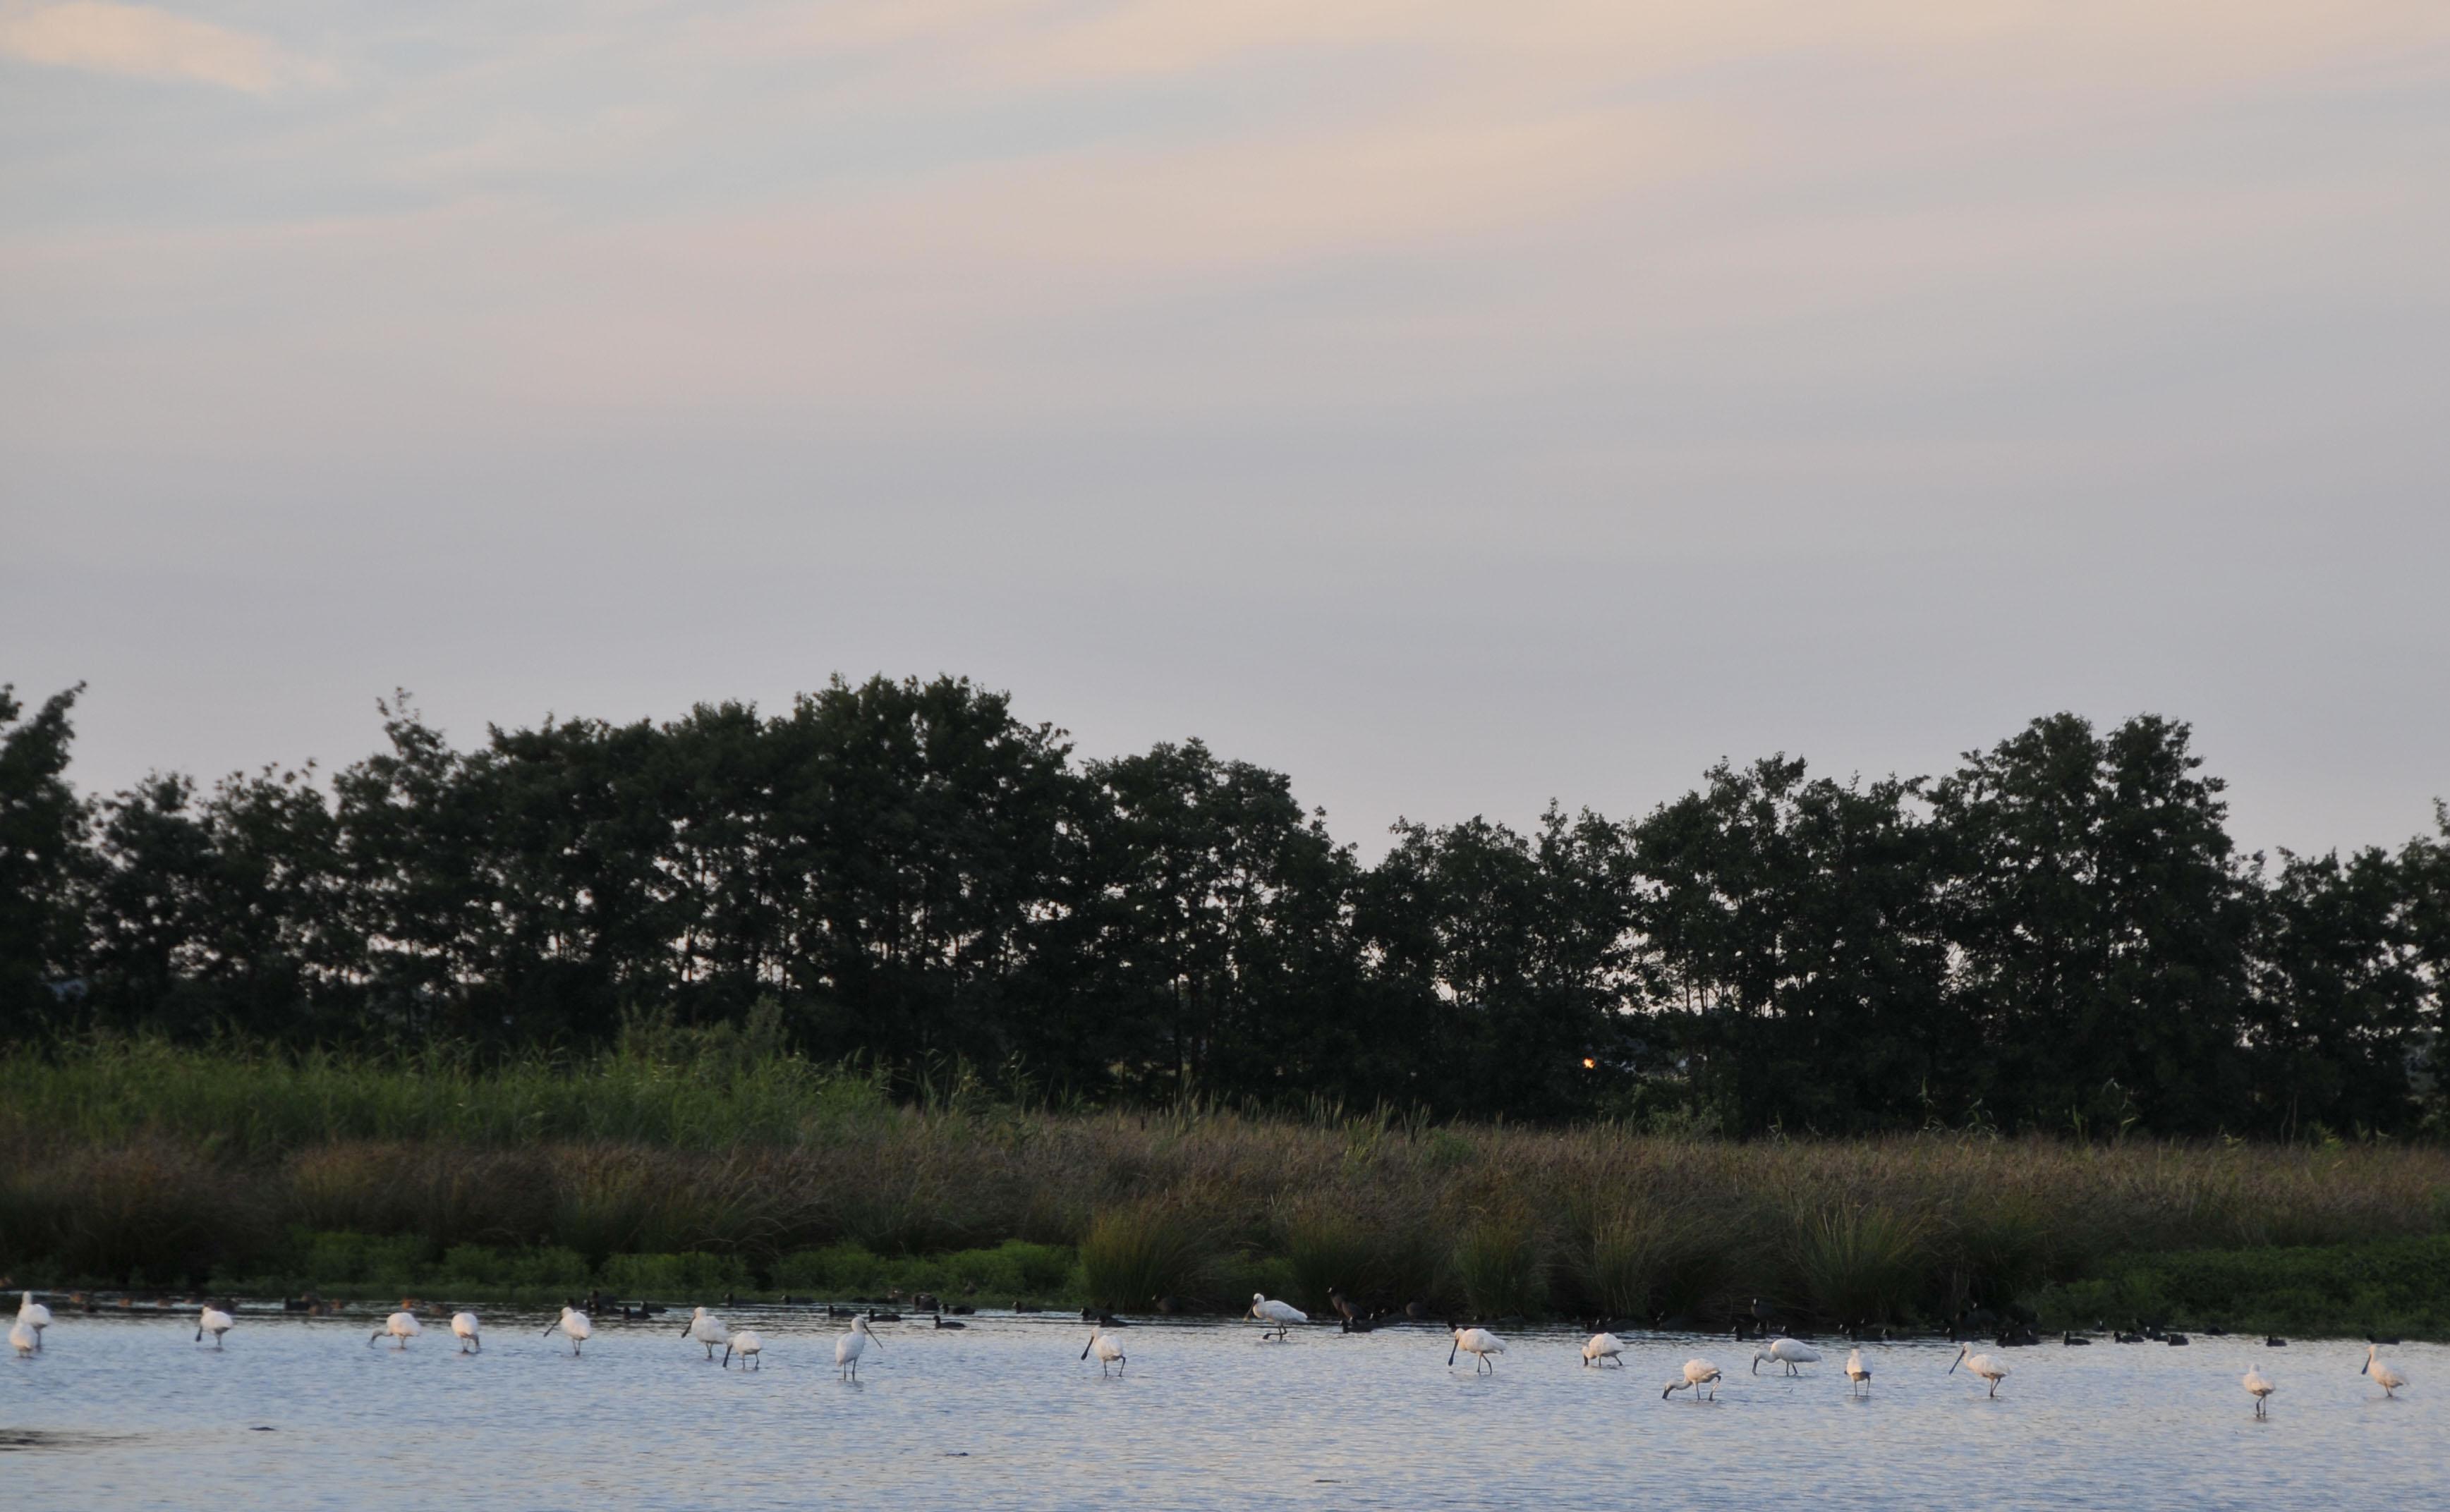 Vele lepelaars slapen in augustus in natuurgebied Willeskop